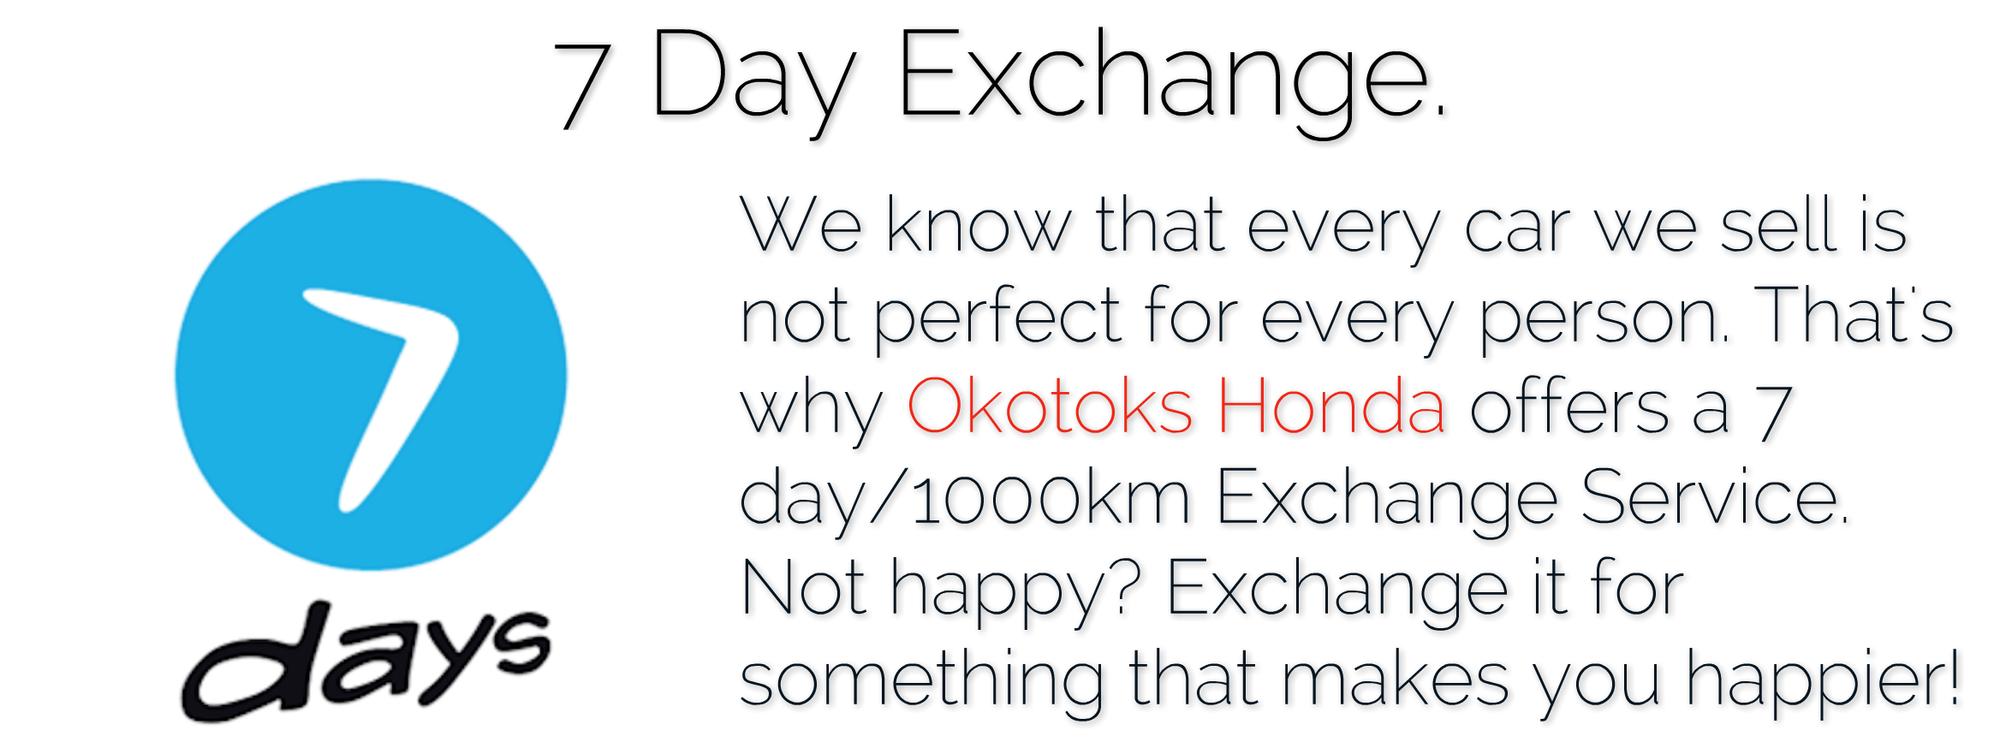 7 Days Exchange